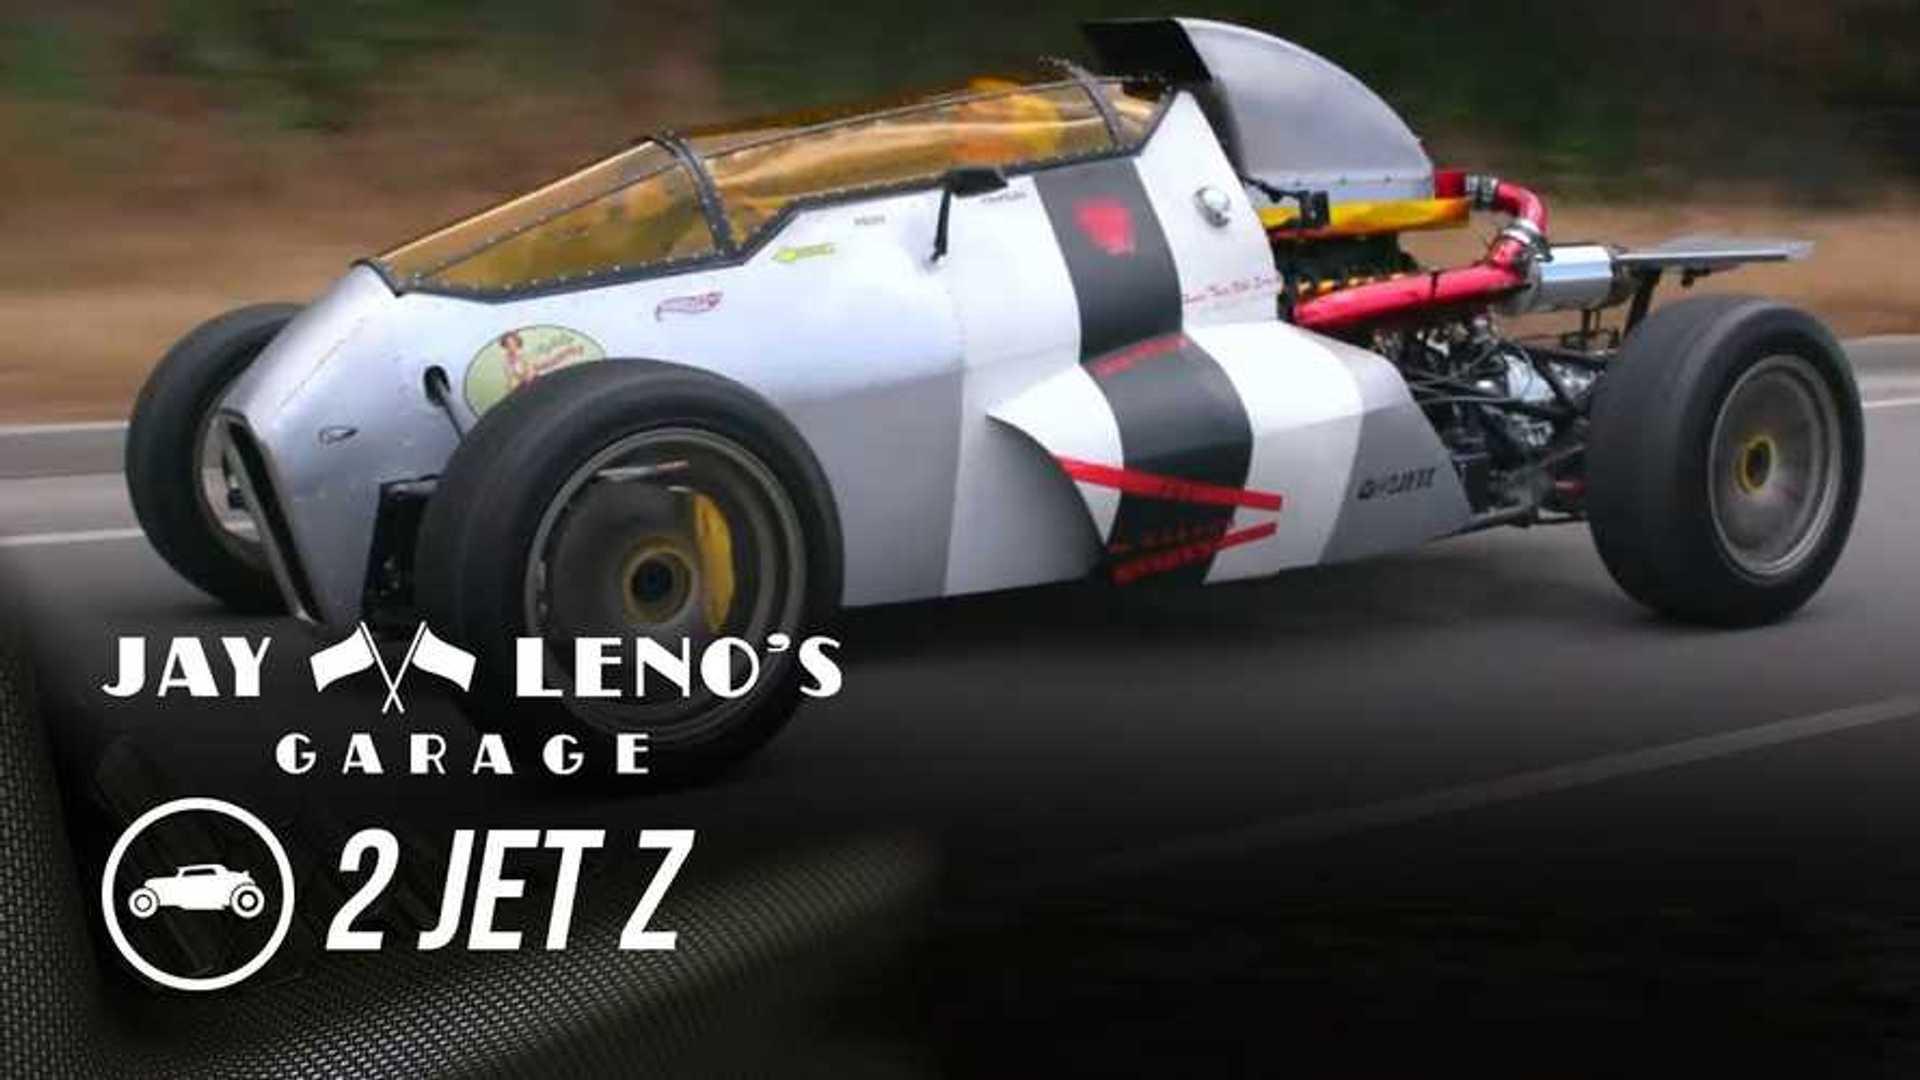 Watch Jay Leno Drive The 2 Jet Z Fighter Plane Car